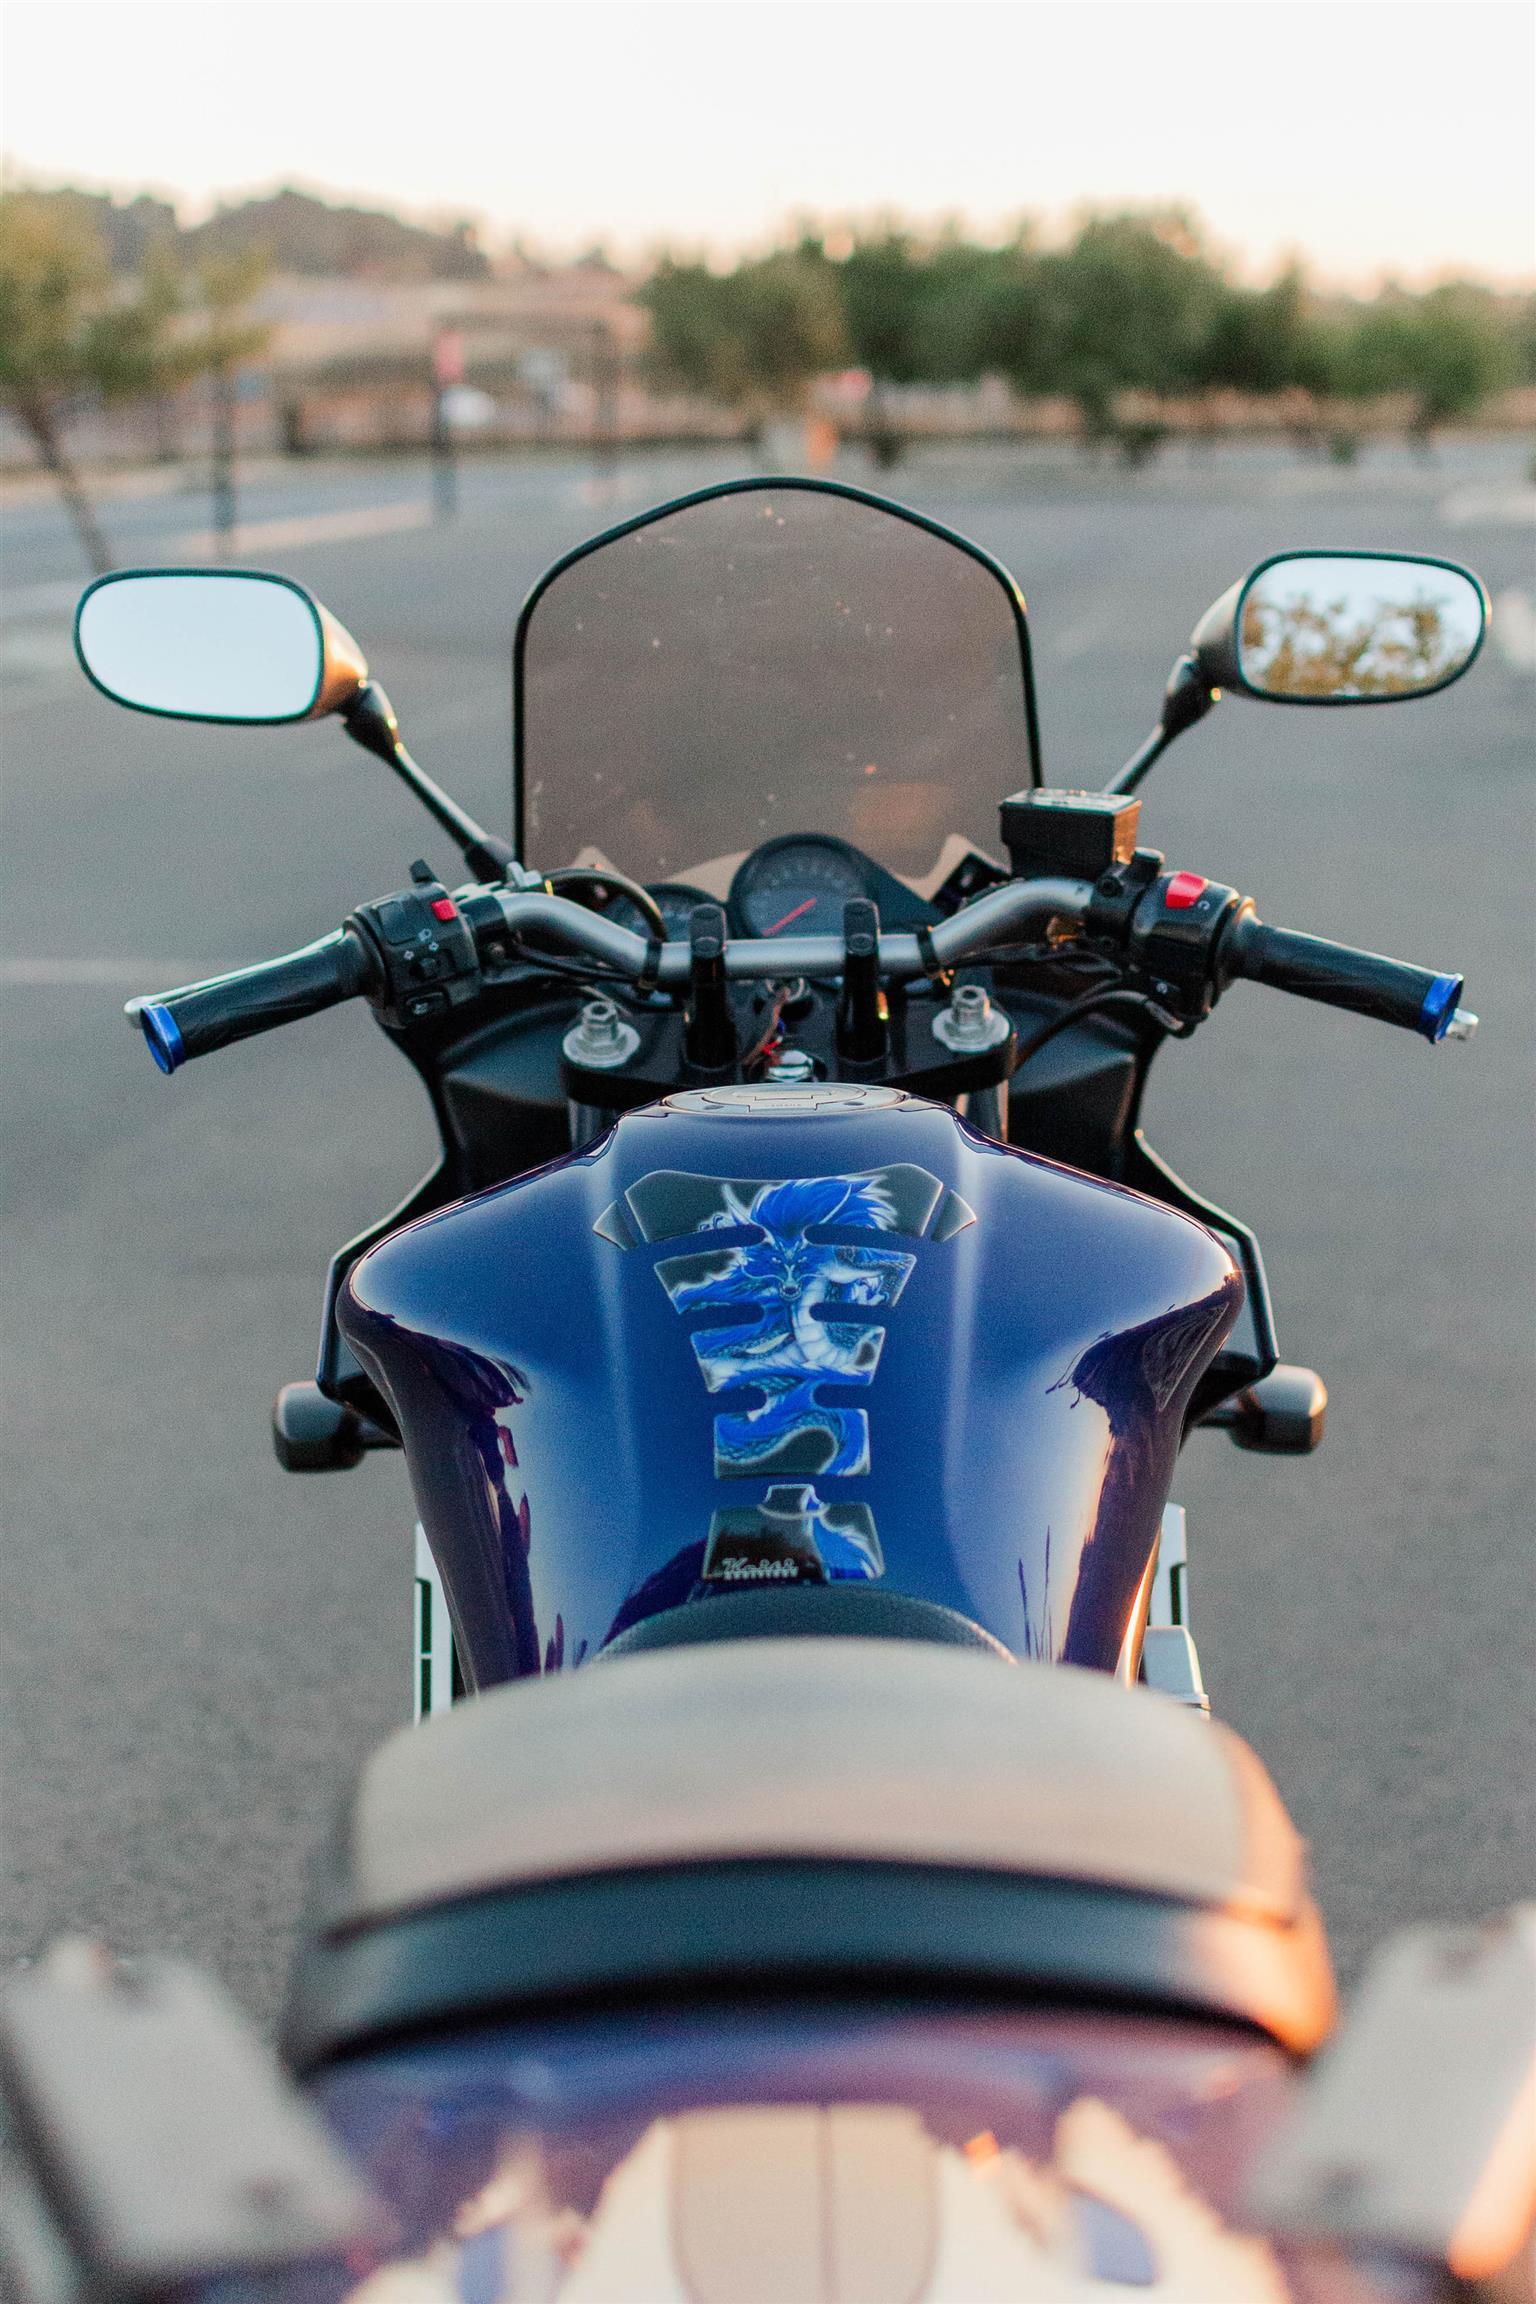 Yamaha Fazer 1000cc for sale